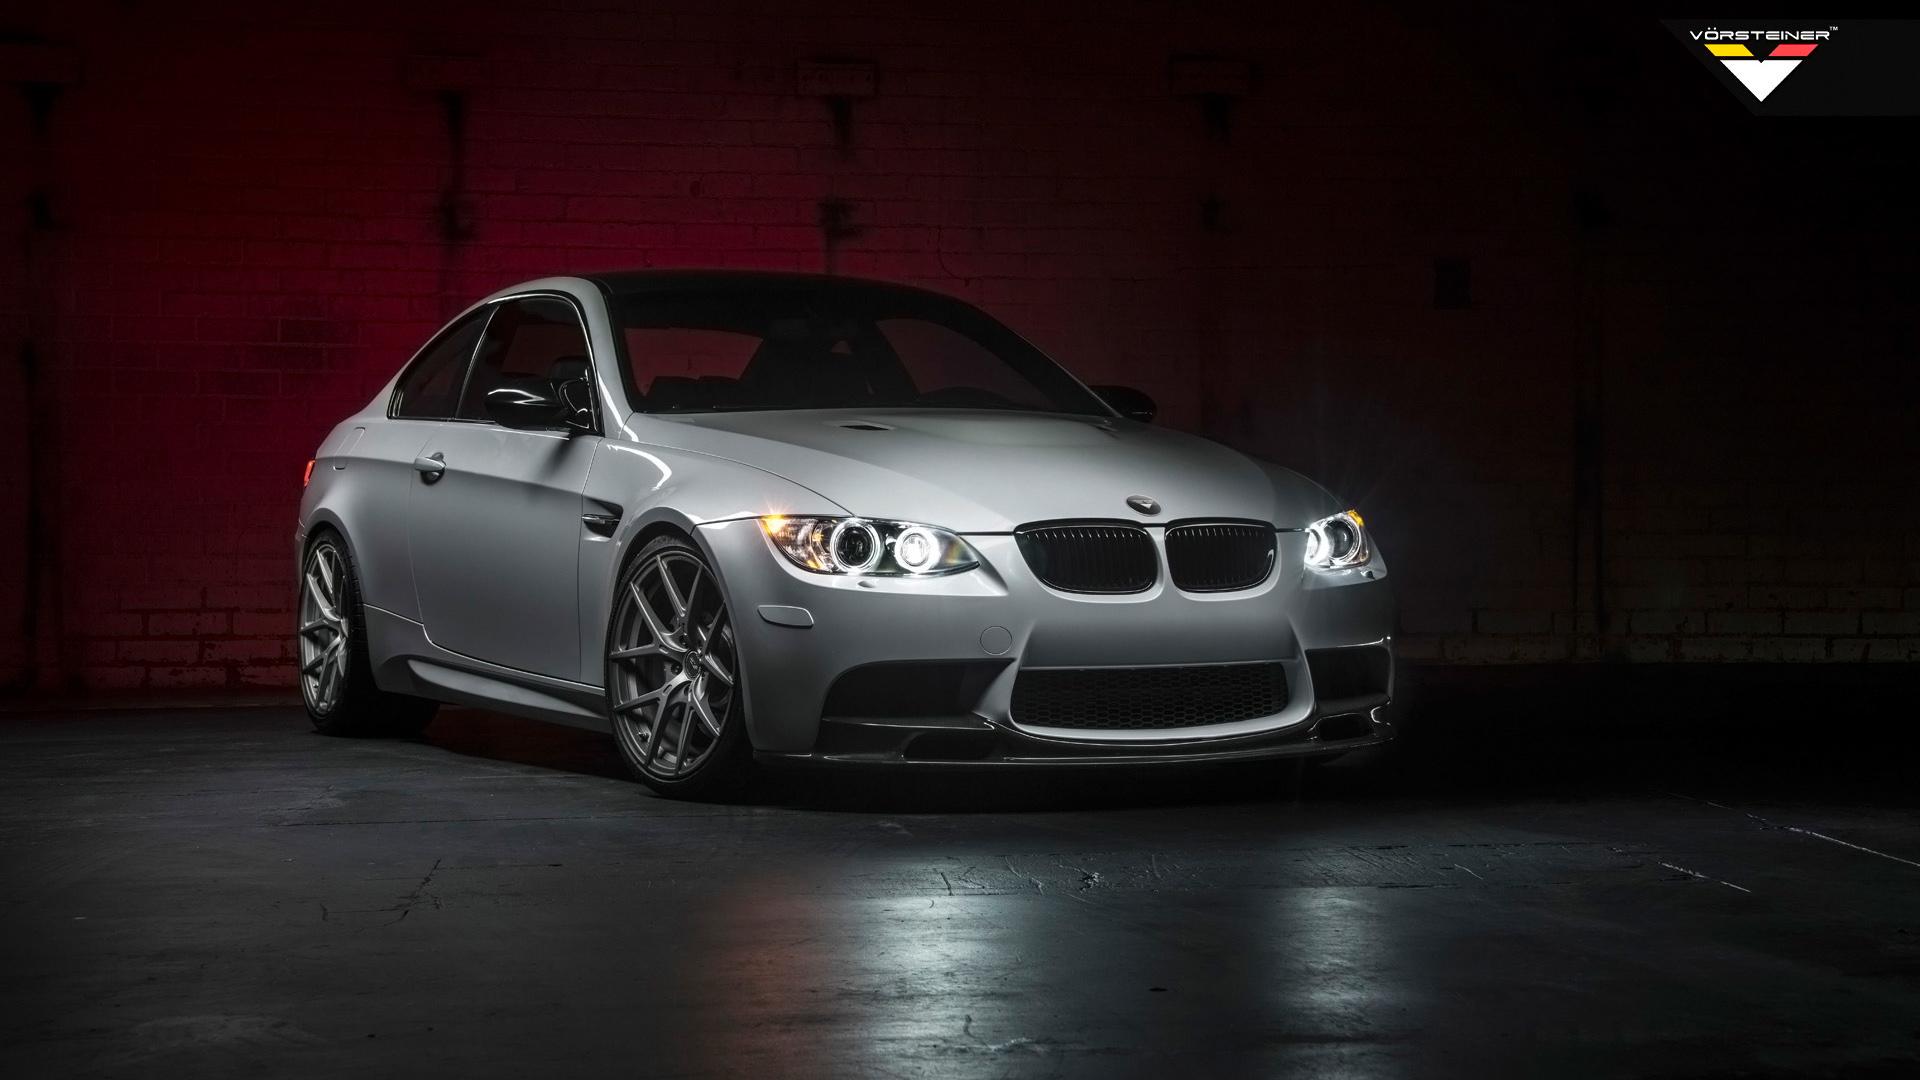 Vorsteiner BMW E92 M3 2014 Wallpaper   HD Car Wallpapers ...